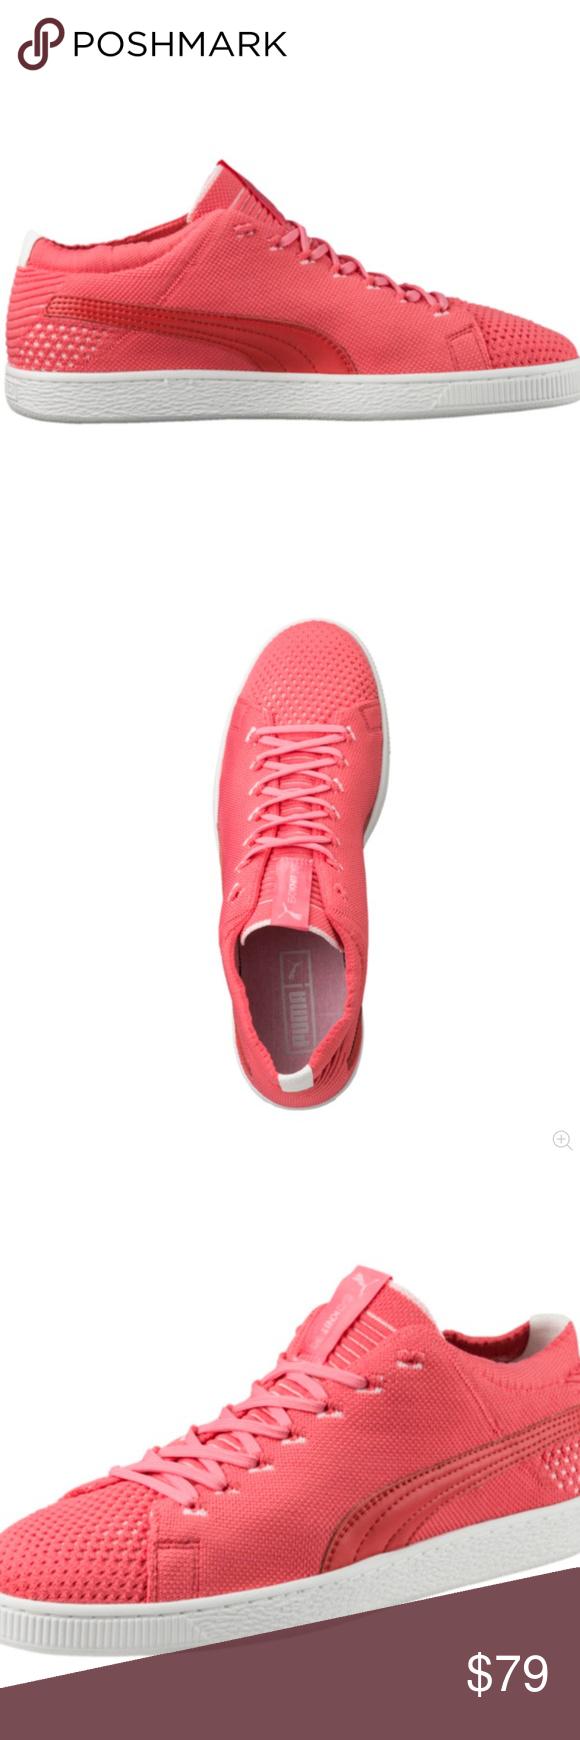 size 40 ad983 6dc5e Puma Basket EvoKNIT 3D Pink Sz 8.5 US 36365007 NWT One of ...